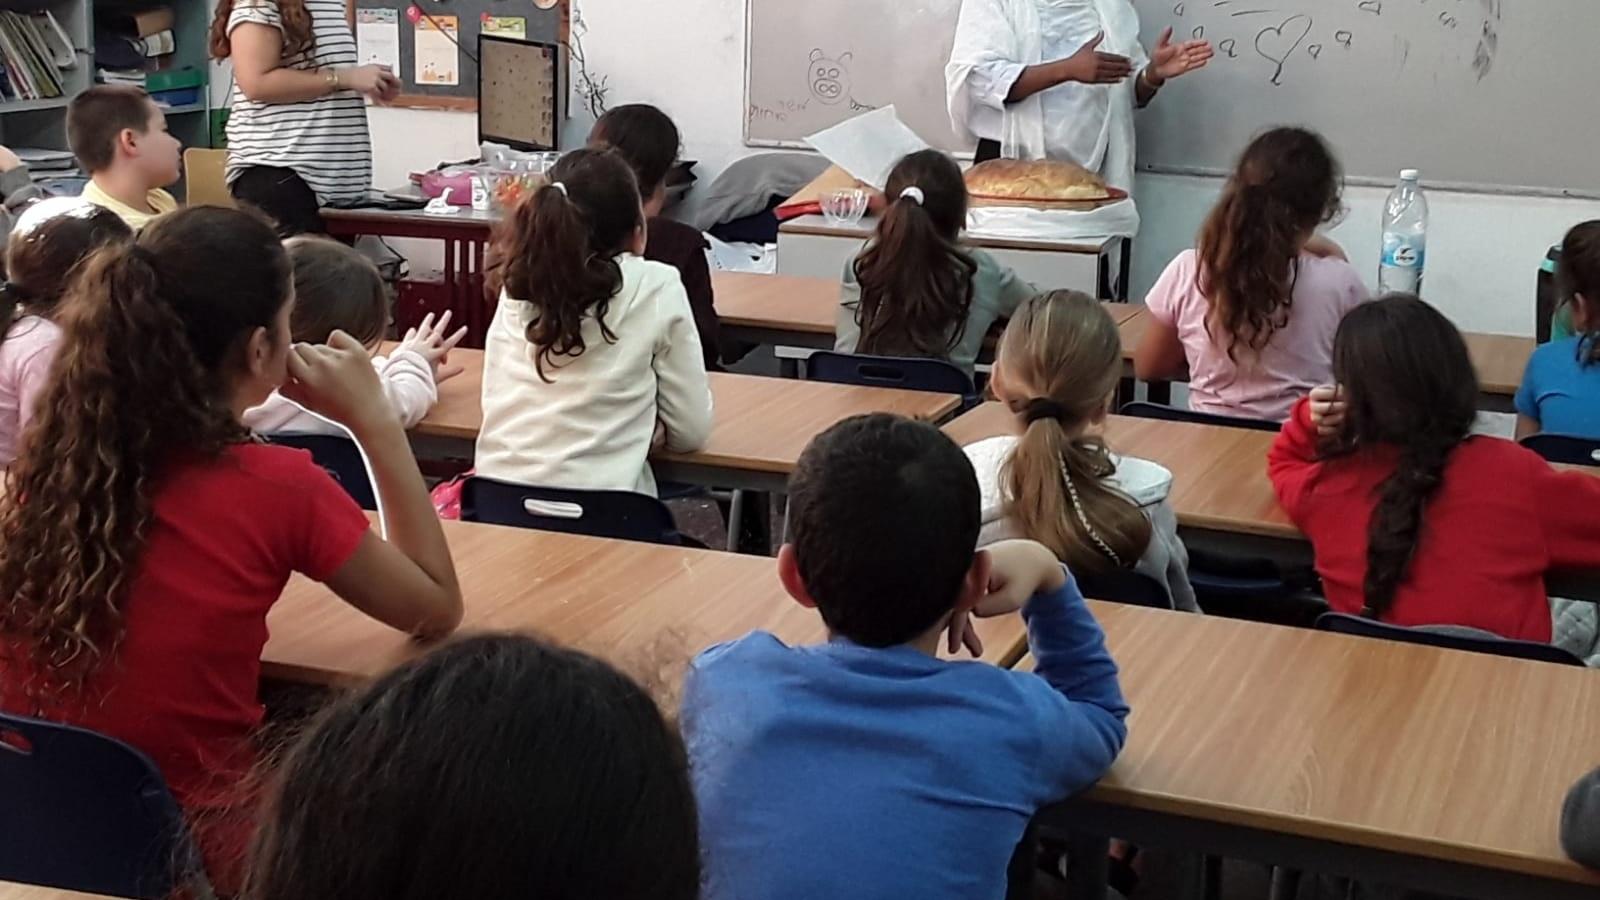 Israel Elementary Schools.jpeg